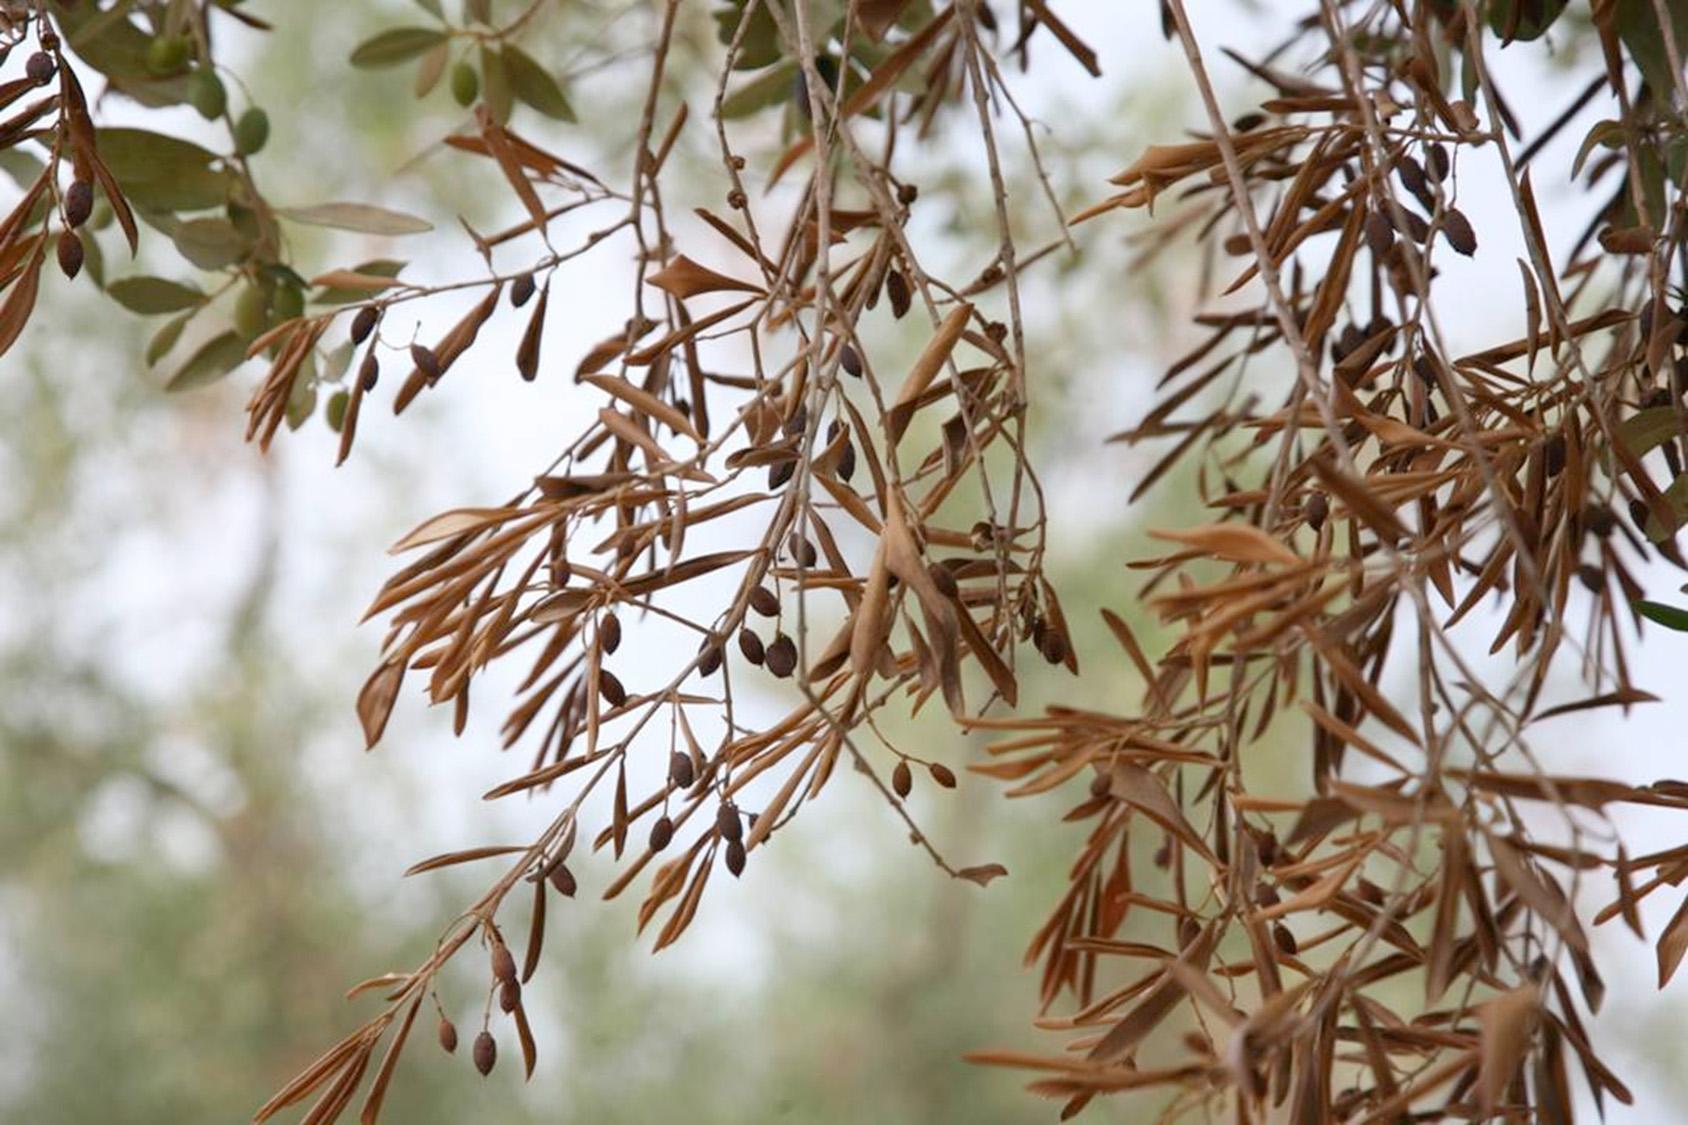 olivo-xylella-fastidiosa